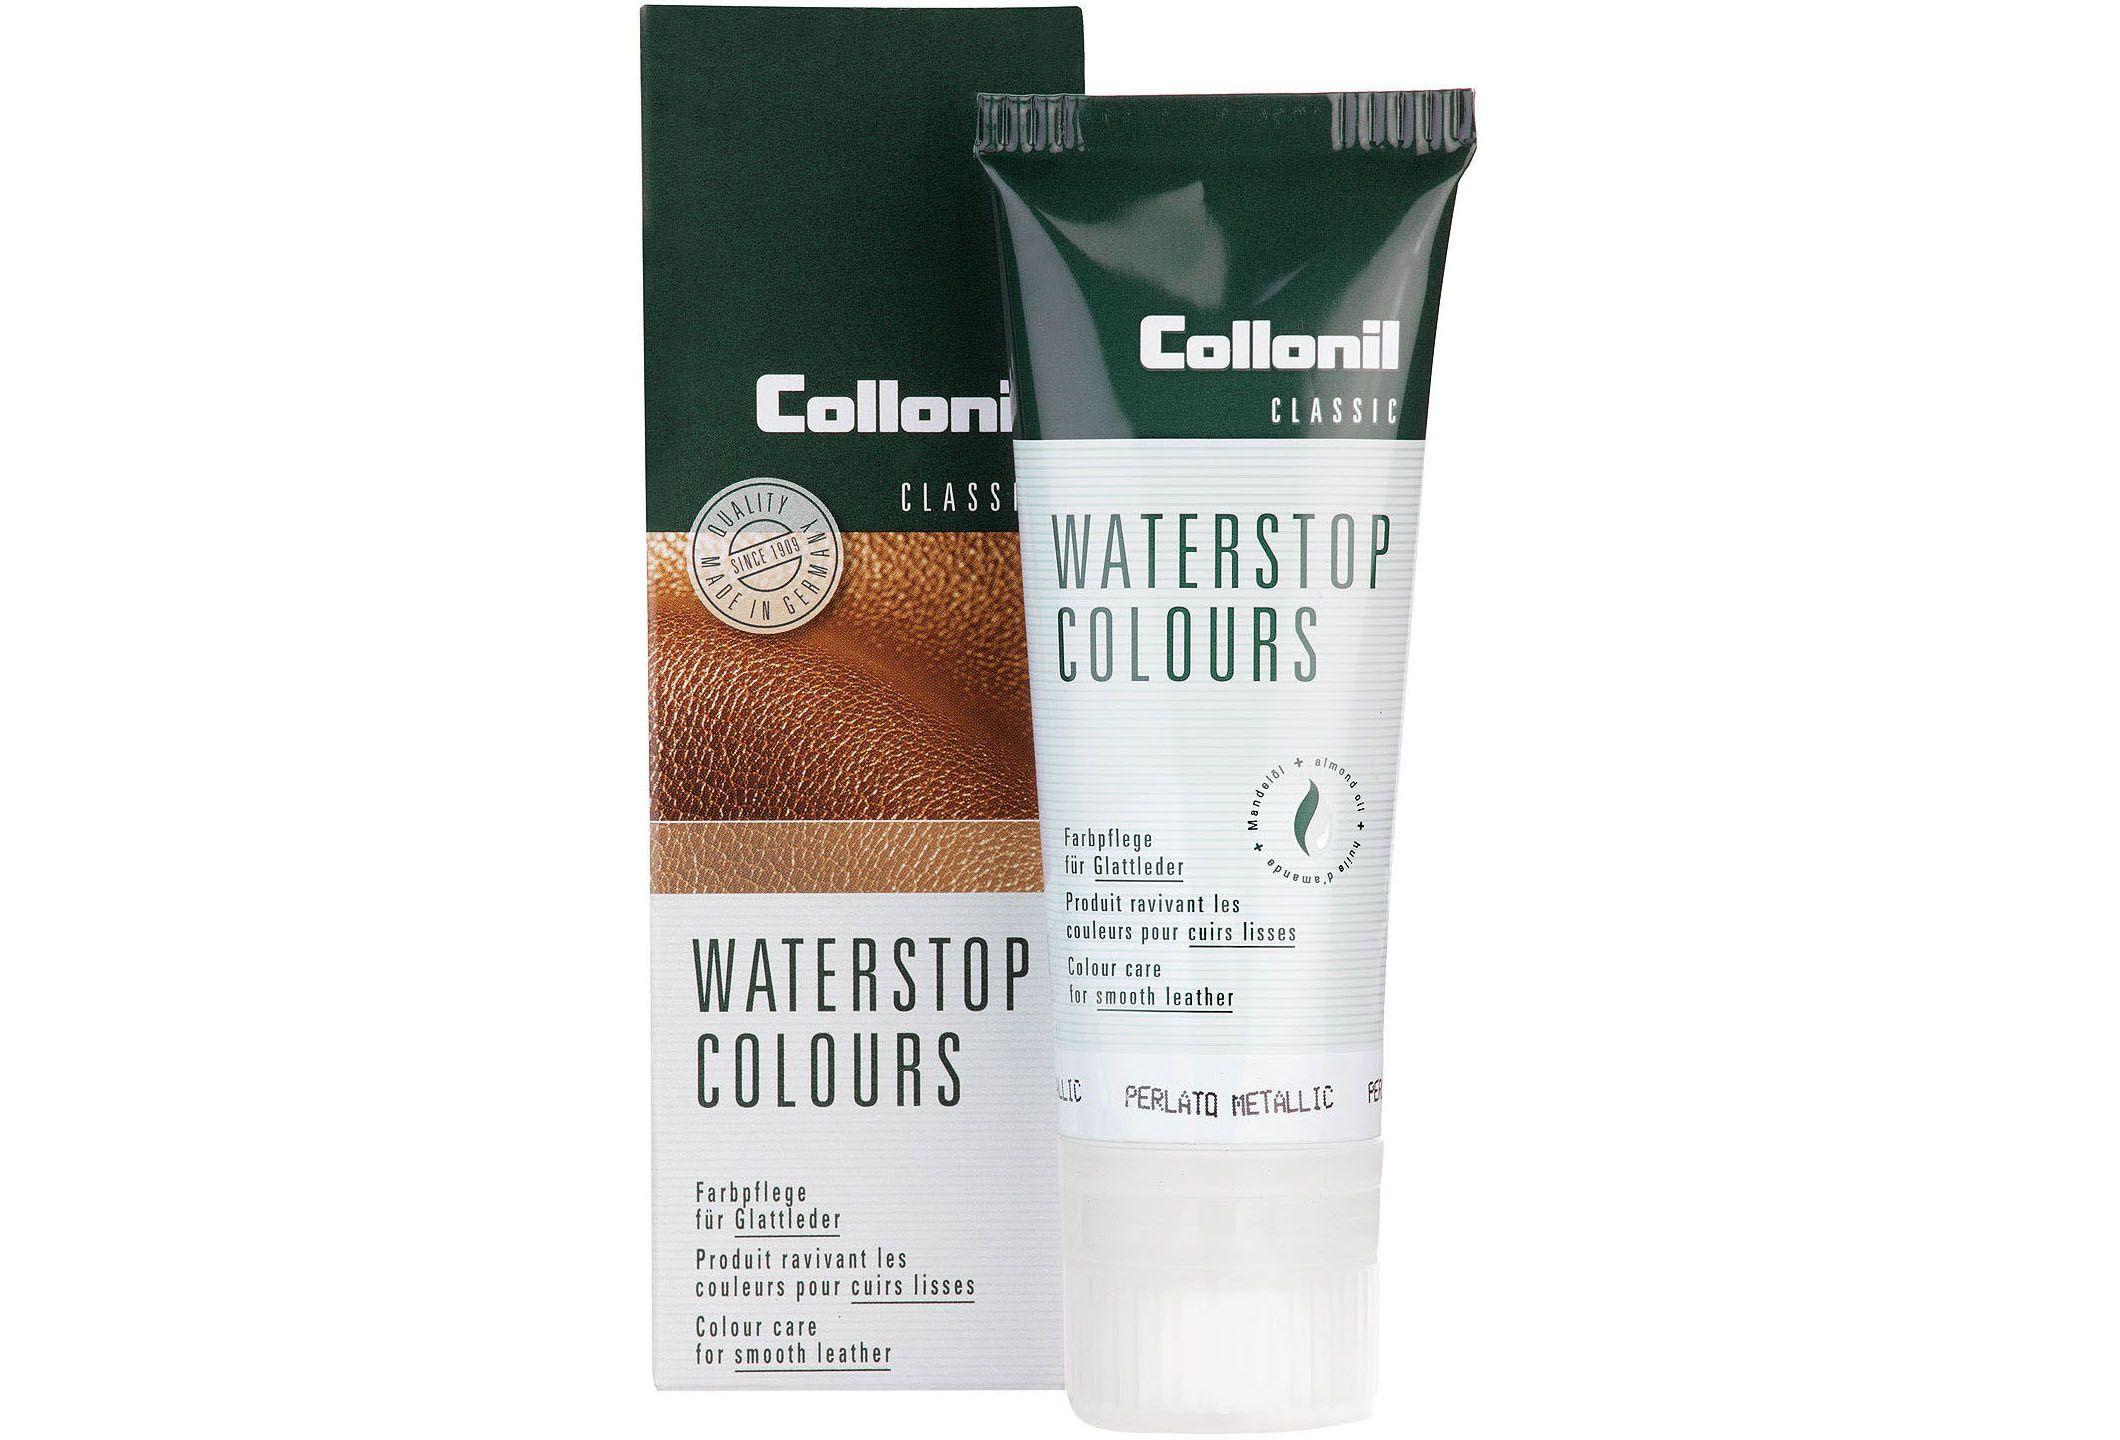 Collonil WATERSTOP COLOURS - Farbpflege für Glattleder (Perlato Metallic)